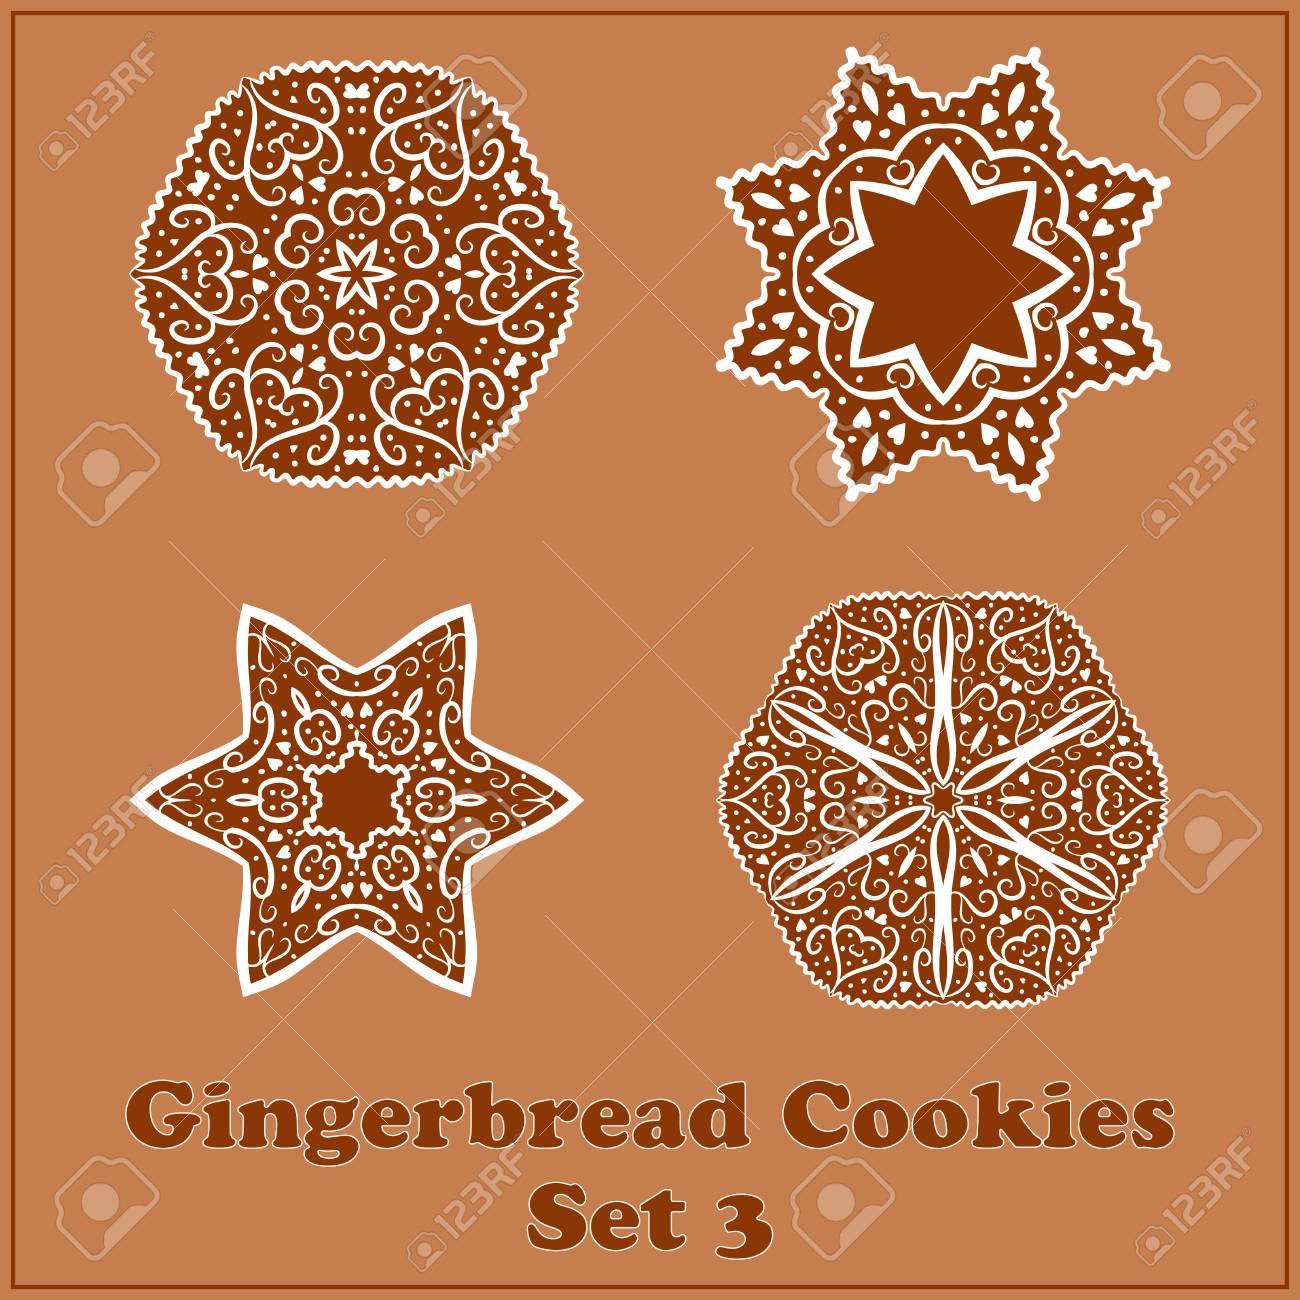 Vector Gingerbread Snowflakes Cookies Set No 3 Merry Christmas